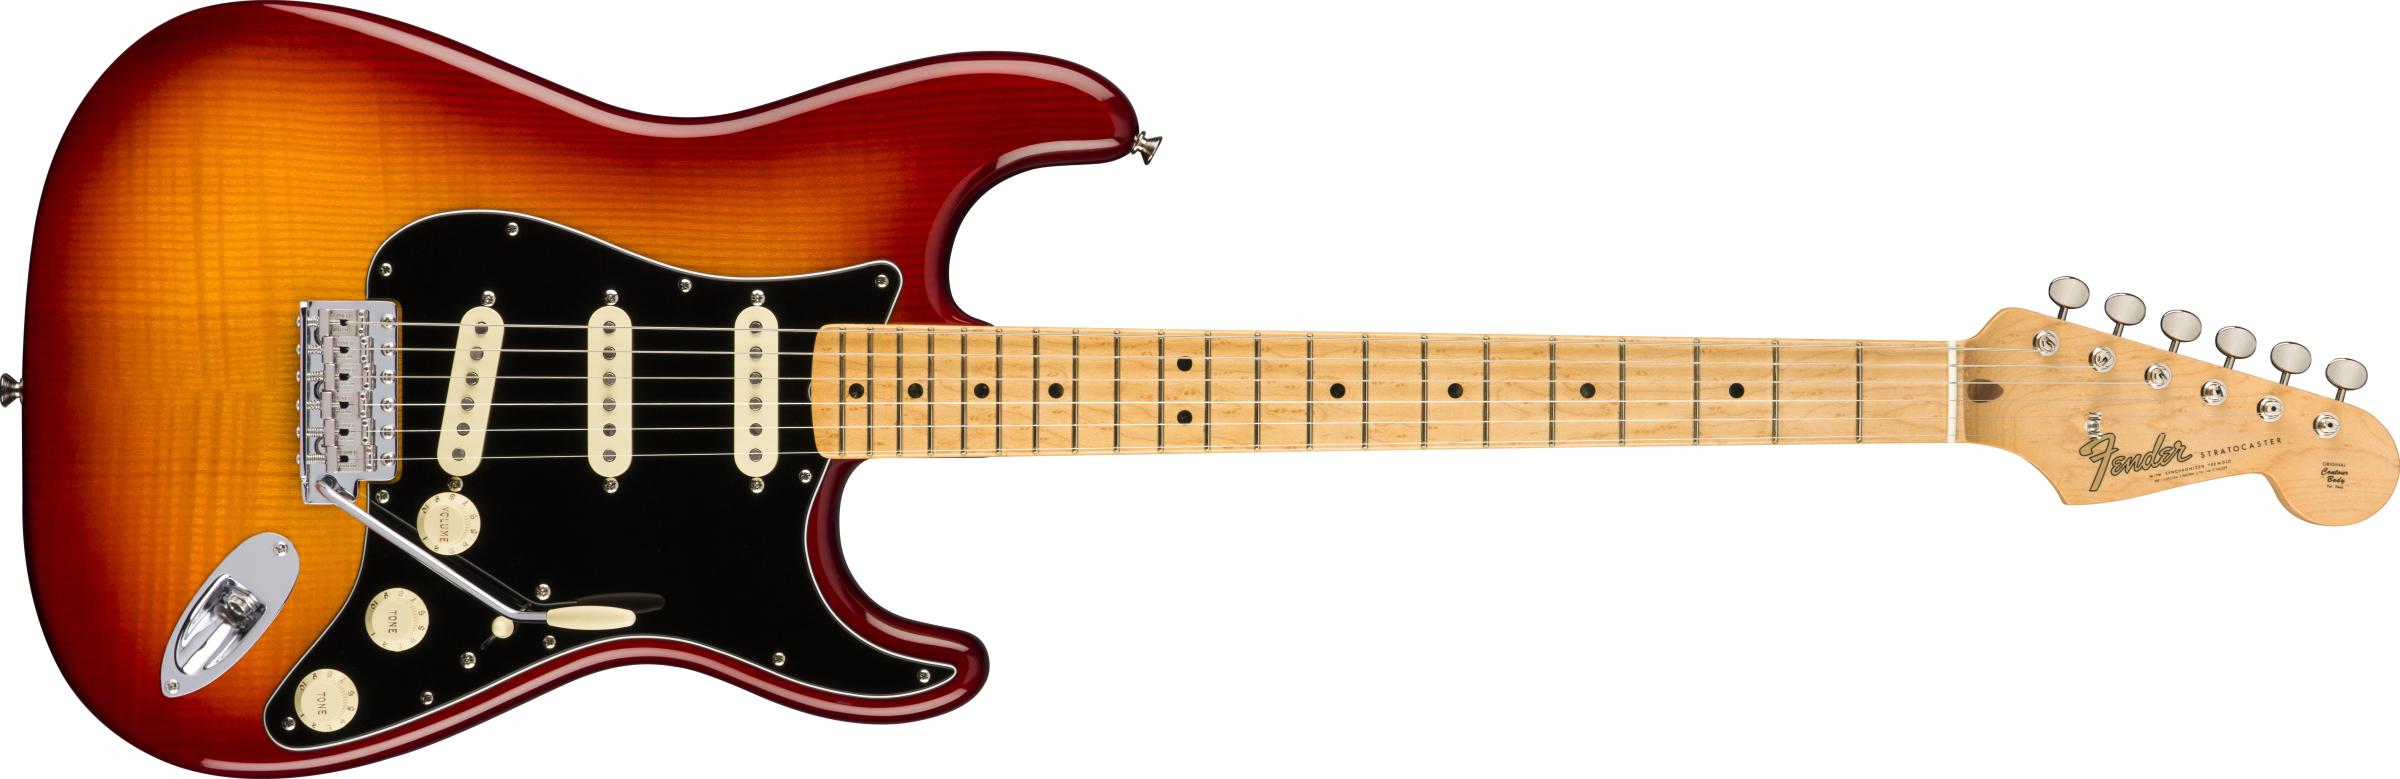 FENDER-Rarities-Flame-Ash-Top-Stratocaster-Birdseye-Maple-Neck-Plasma-Red-Burst-sku-571003048